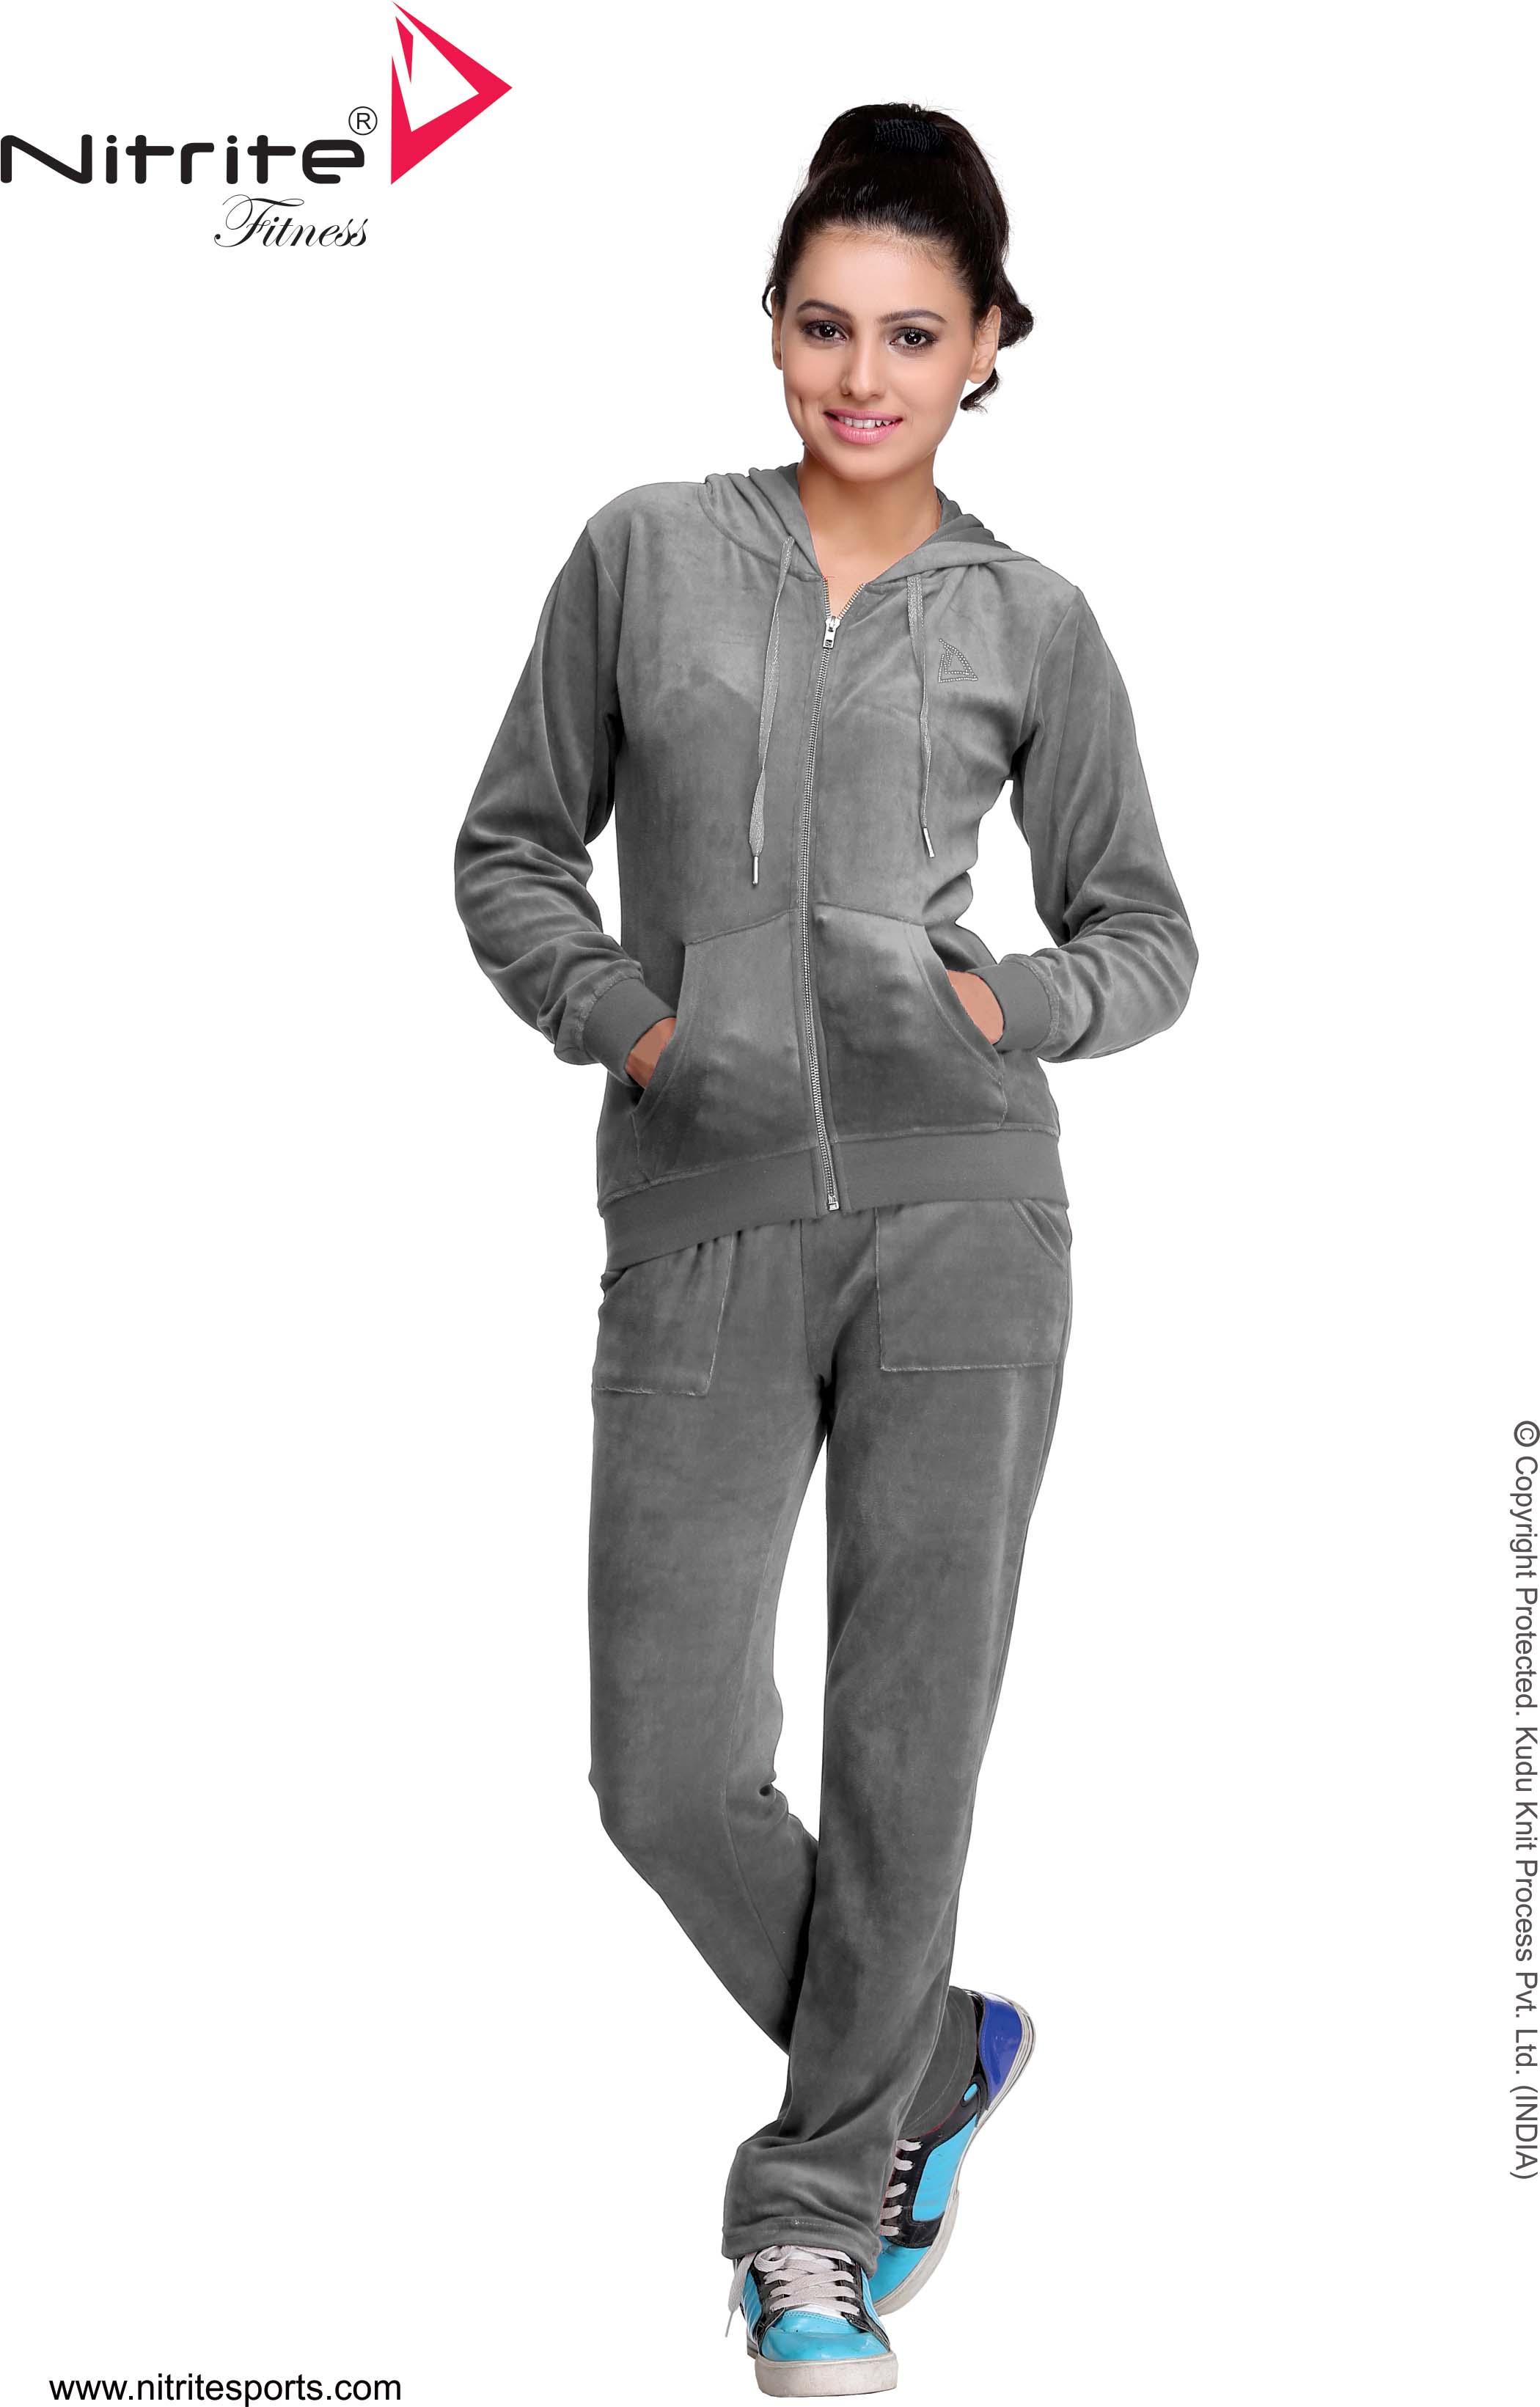 Women s yoga sets sport suit workout clothes female fitness sports - Bulk Tracksuit Manufacturer In India Sportswear Manufacturer In India Track Pant Manufacturer Tracksuit